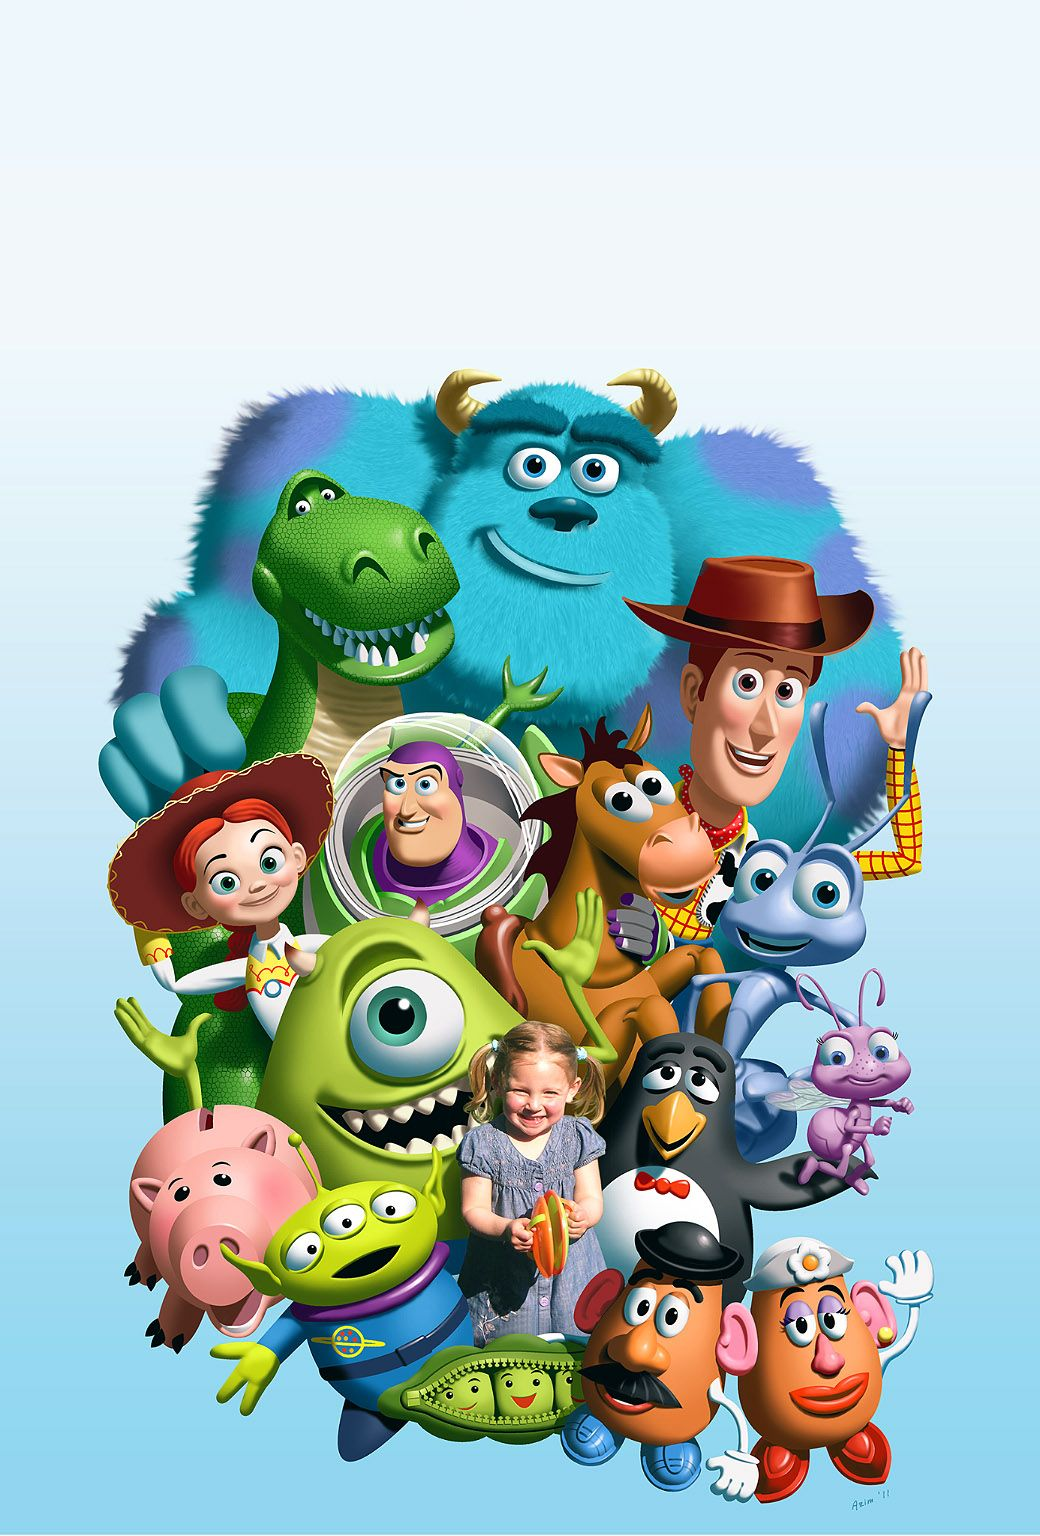 Pixar Iphone Wallpapers Top Free Pixar Iphone Backgrounds Wallpaperaccess